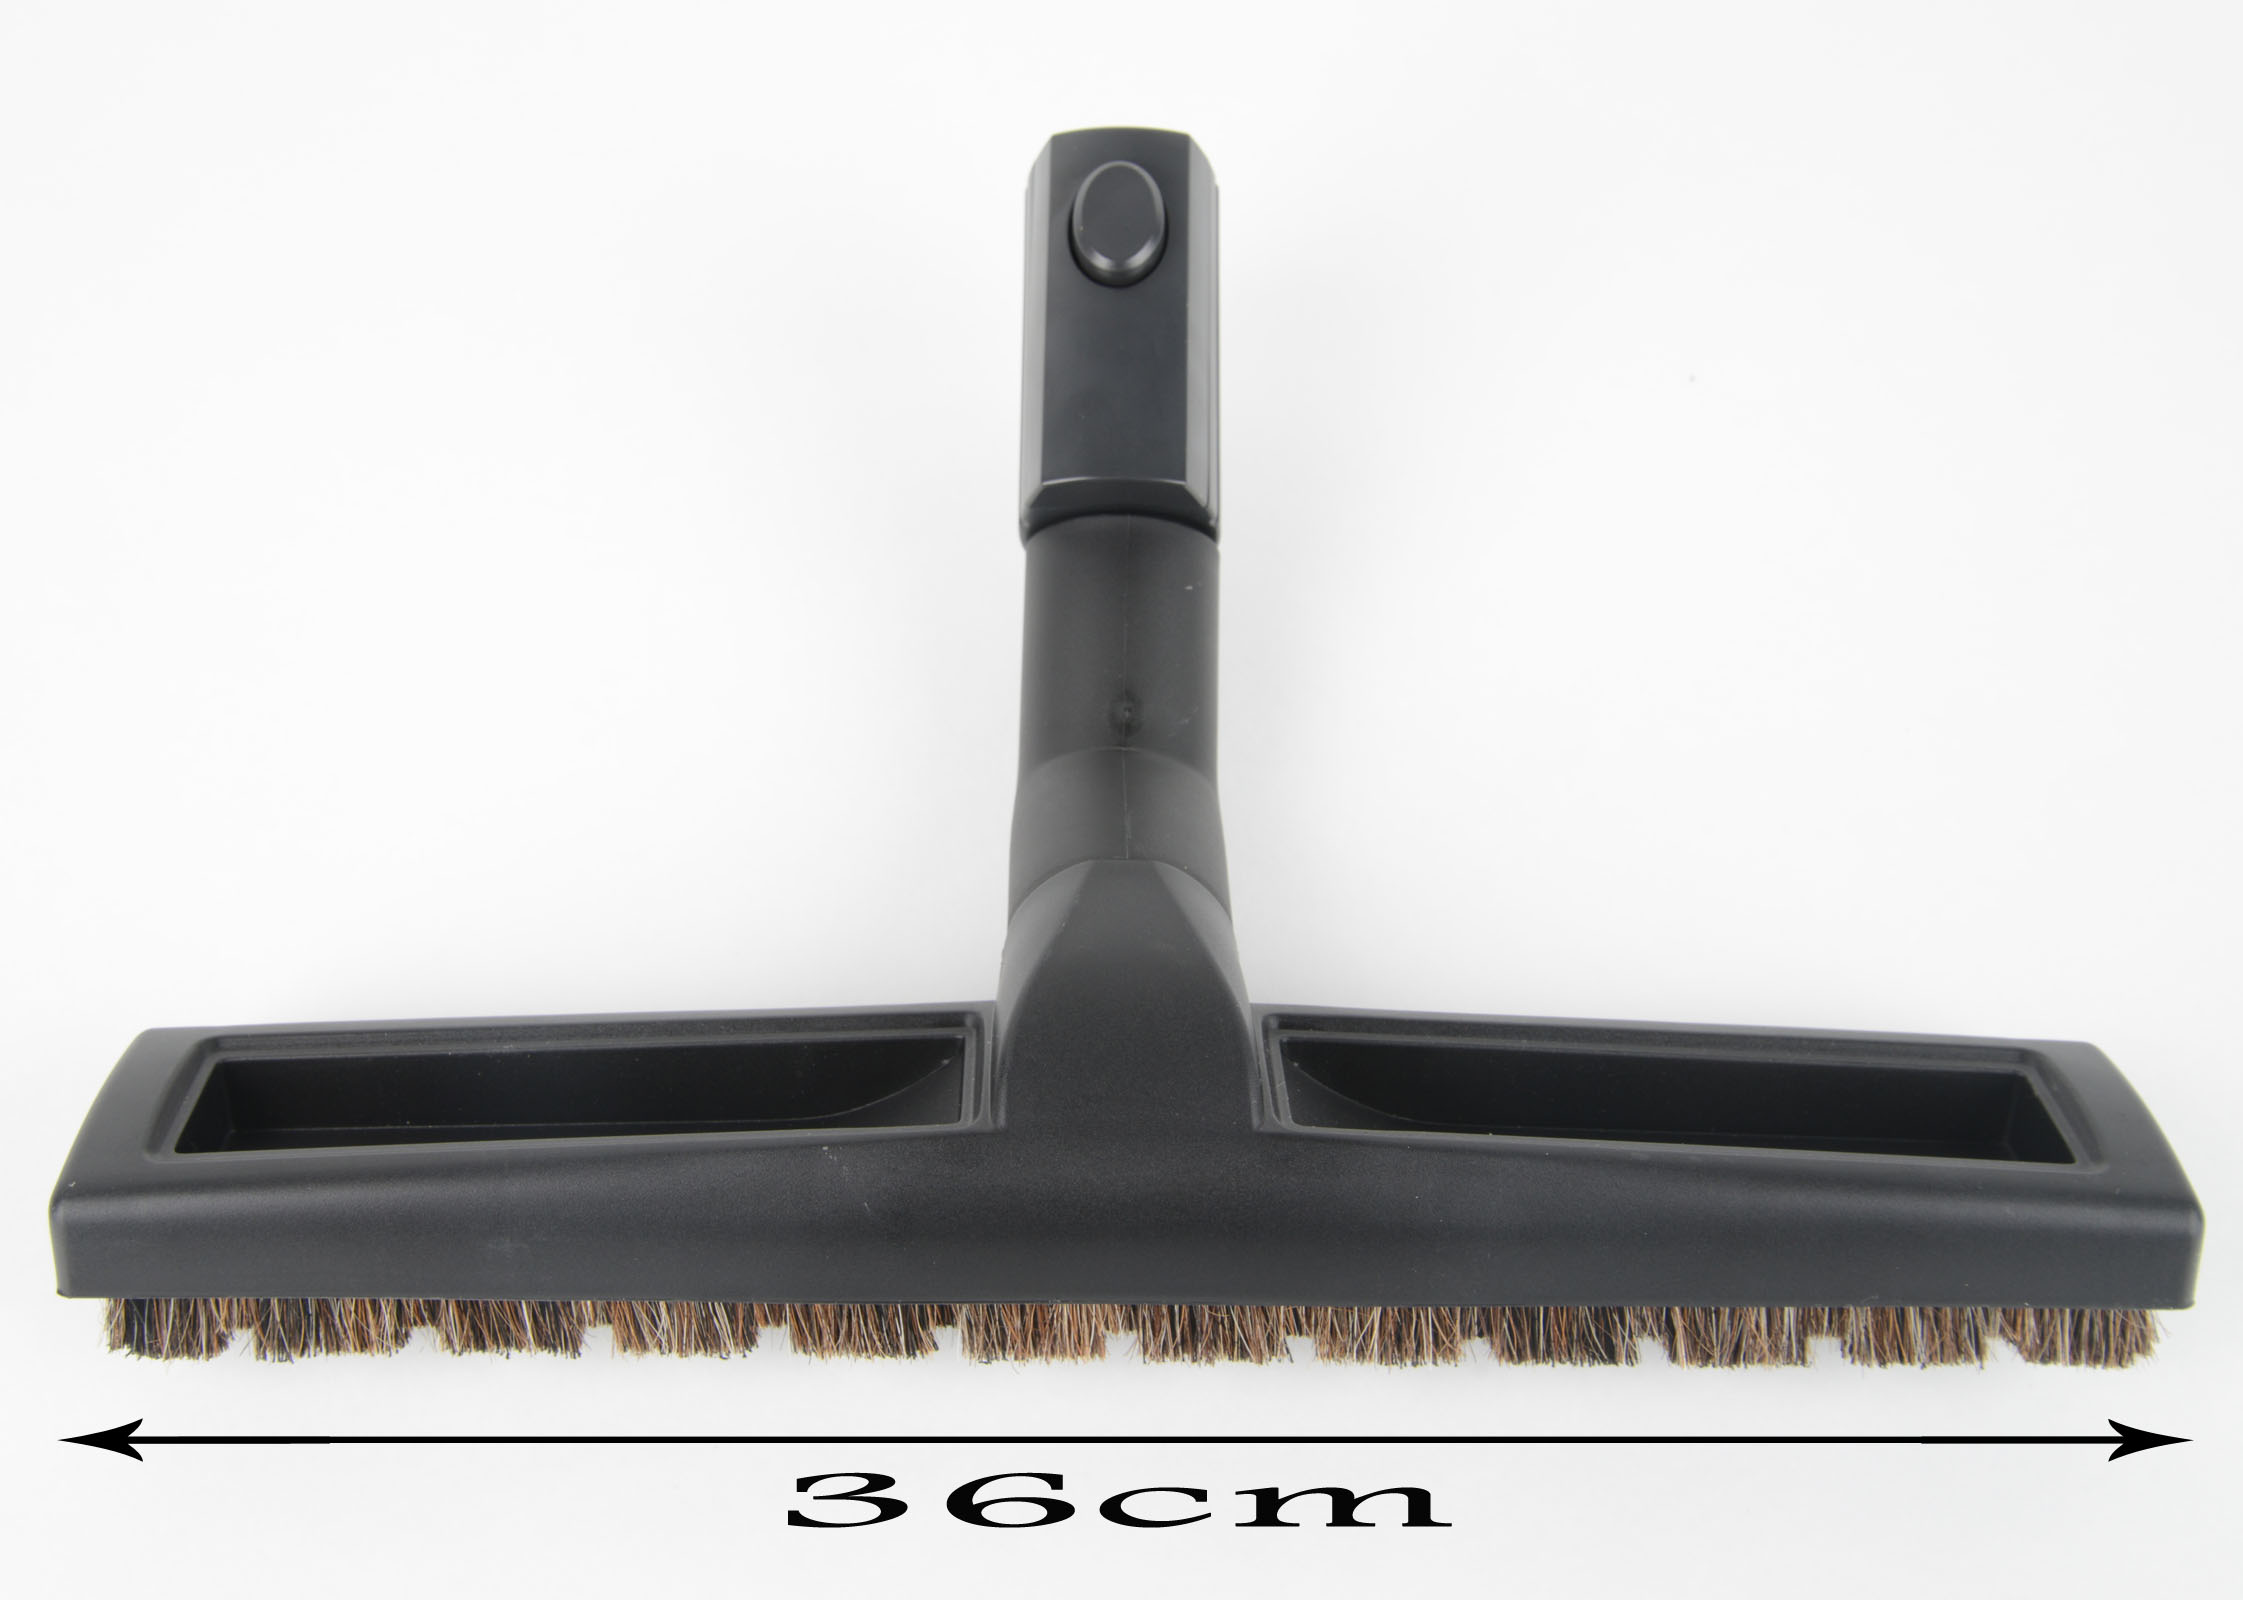 parkettb rste miele haushaltsger te. Black Bedroom Furniture Sets. Home Design Ideas